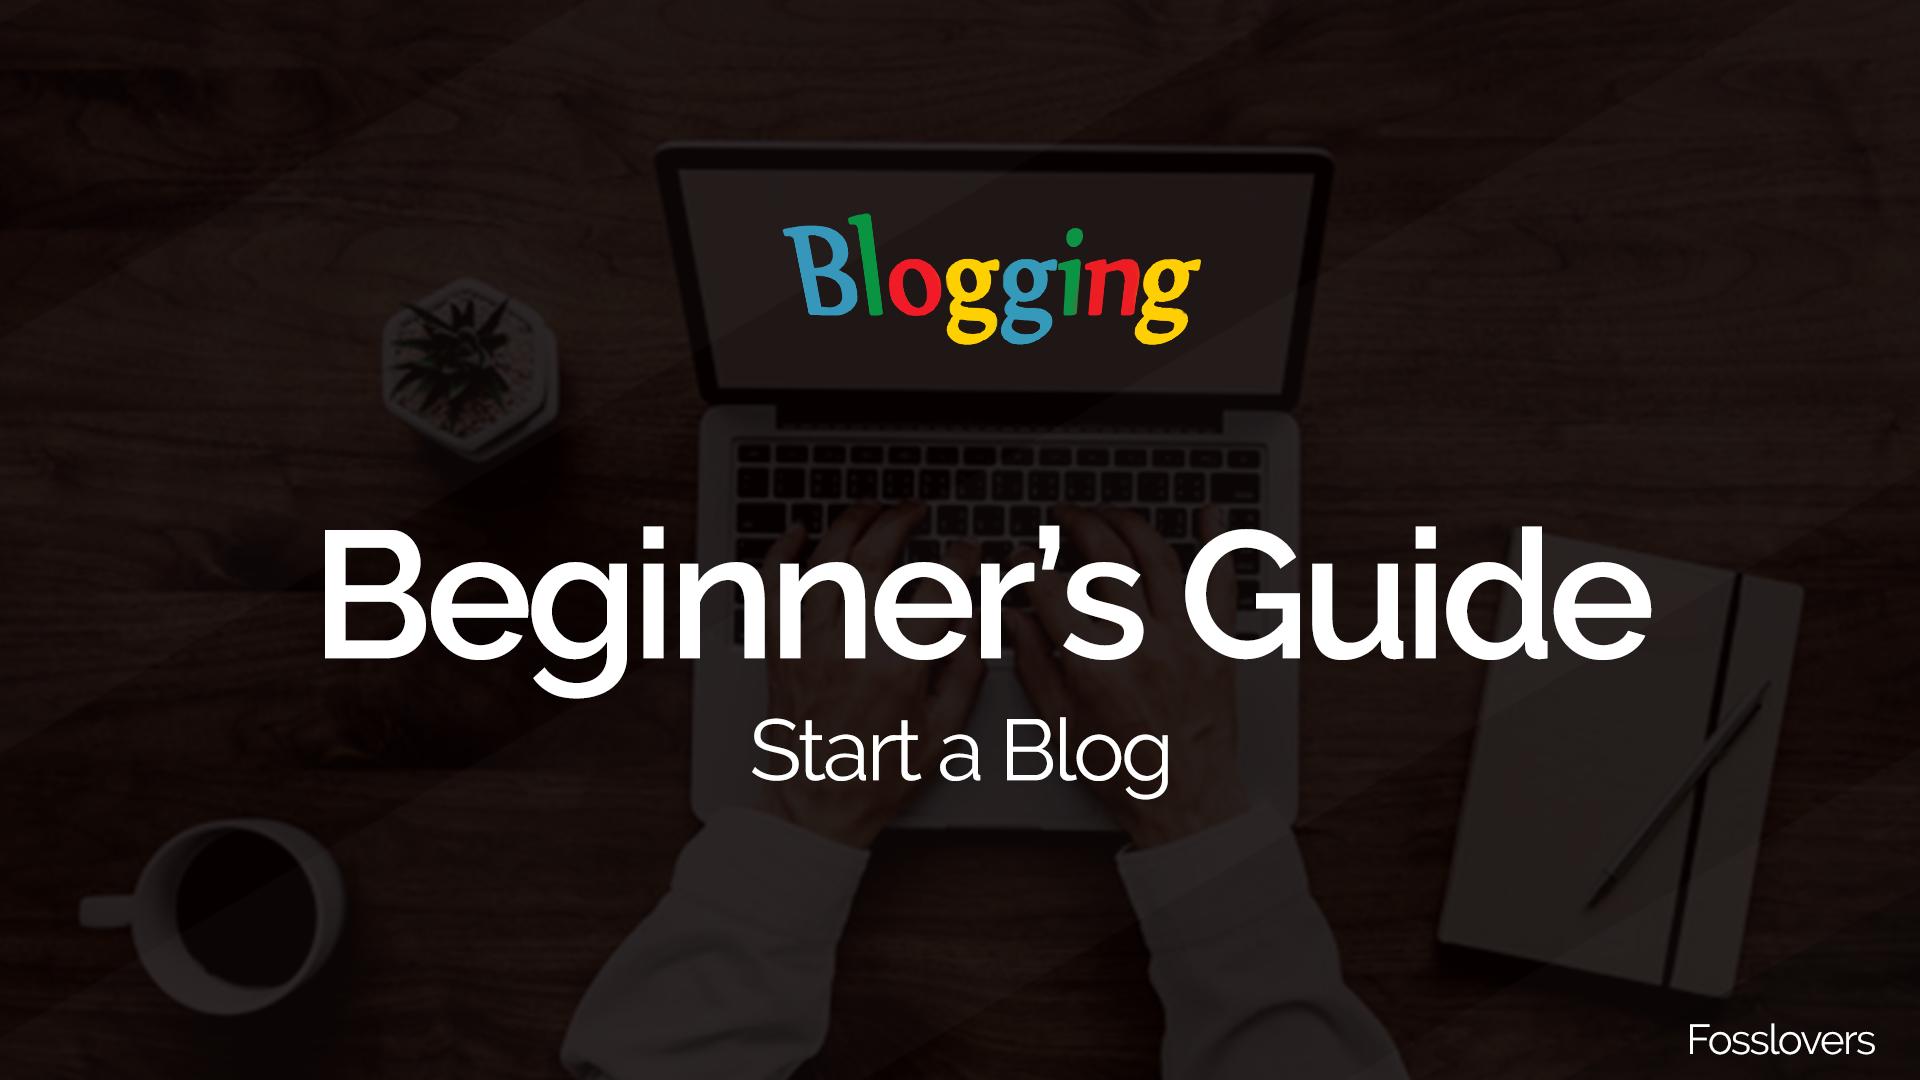 Beginner's Guide to Start a Blog